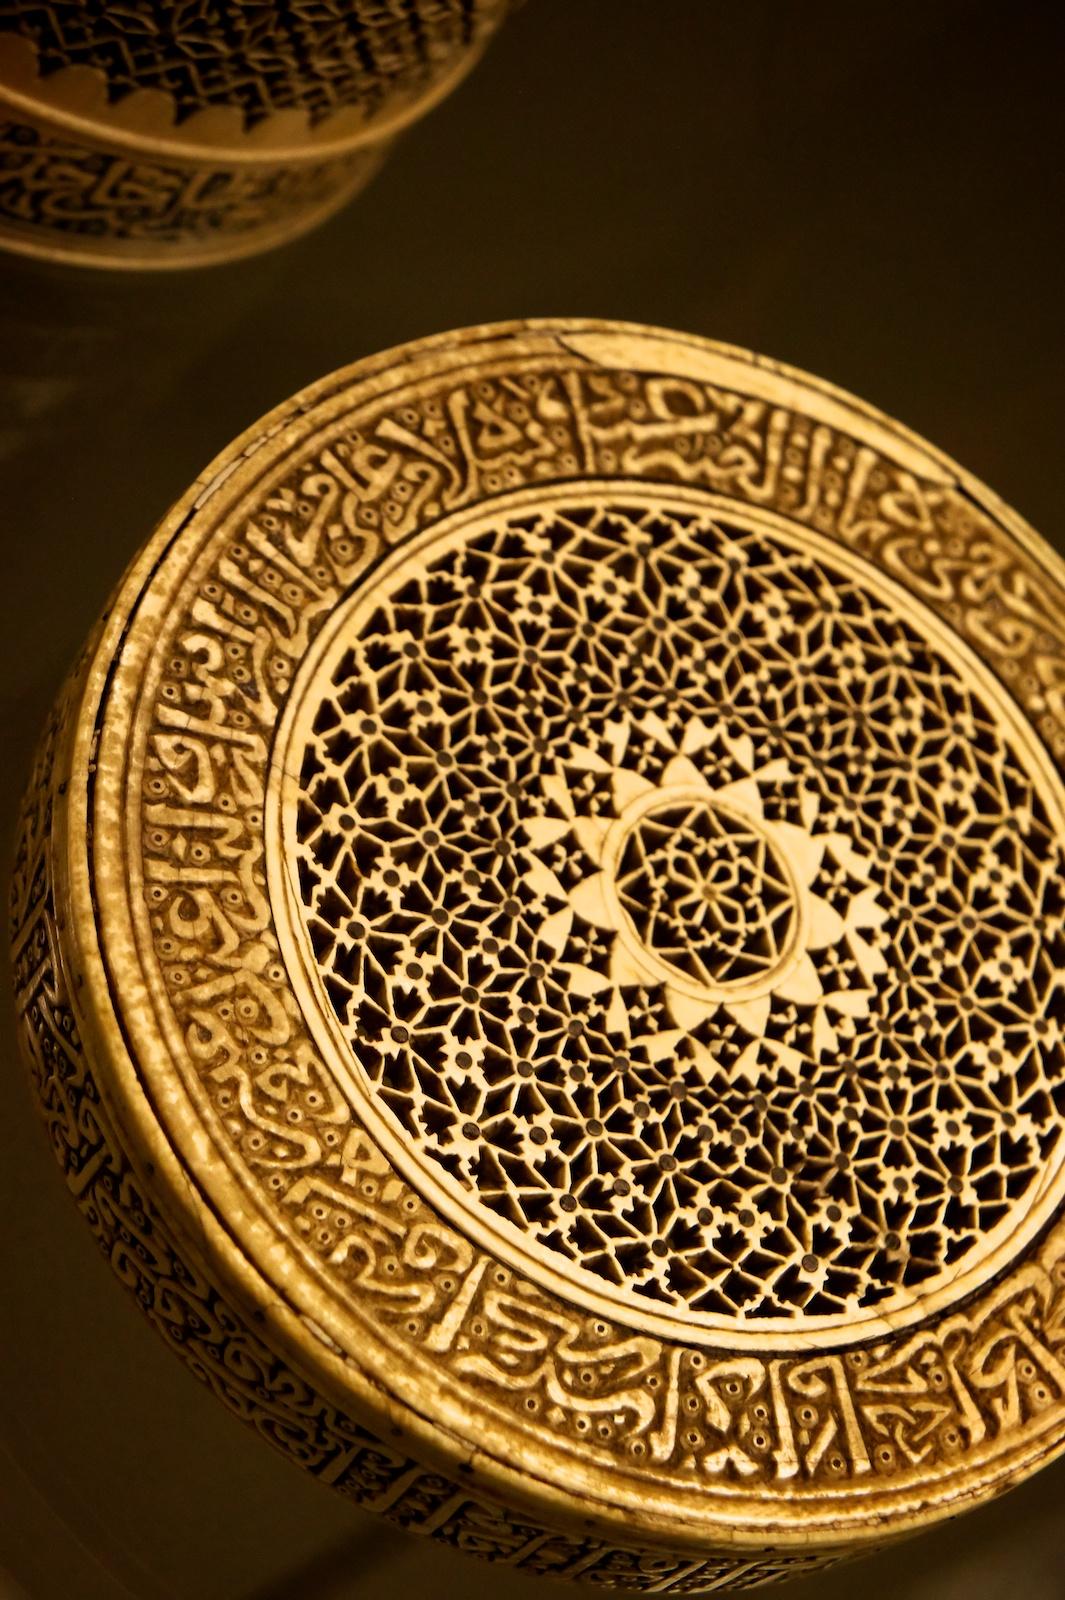 Beautiful Islamic Art - Articles about Islam